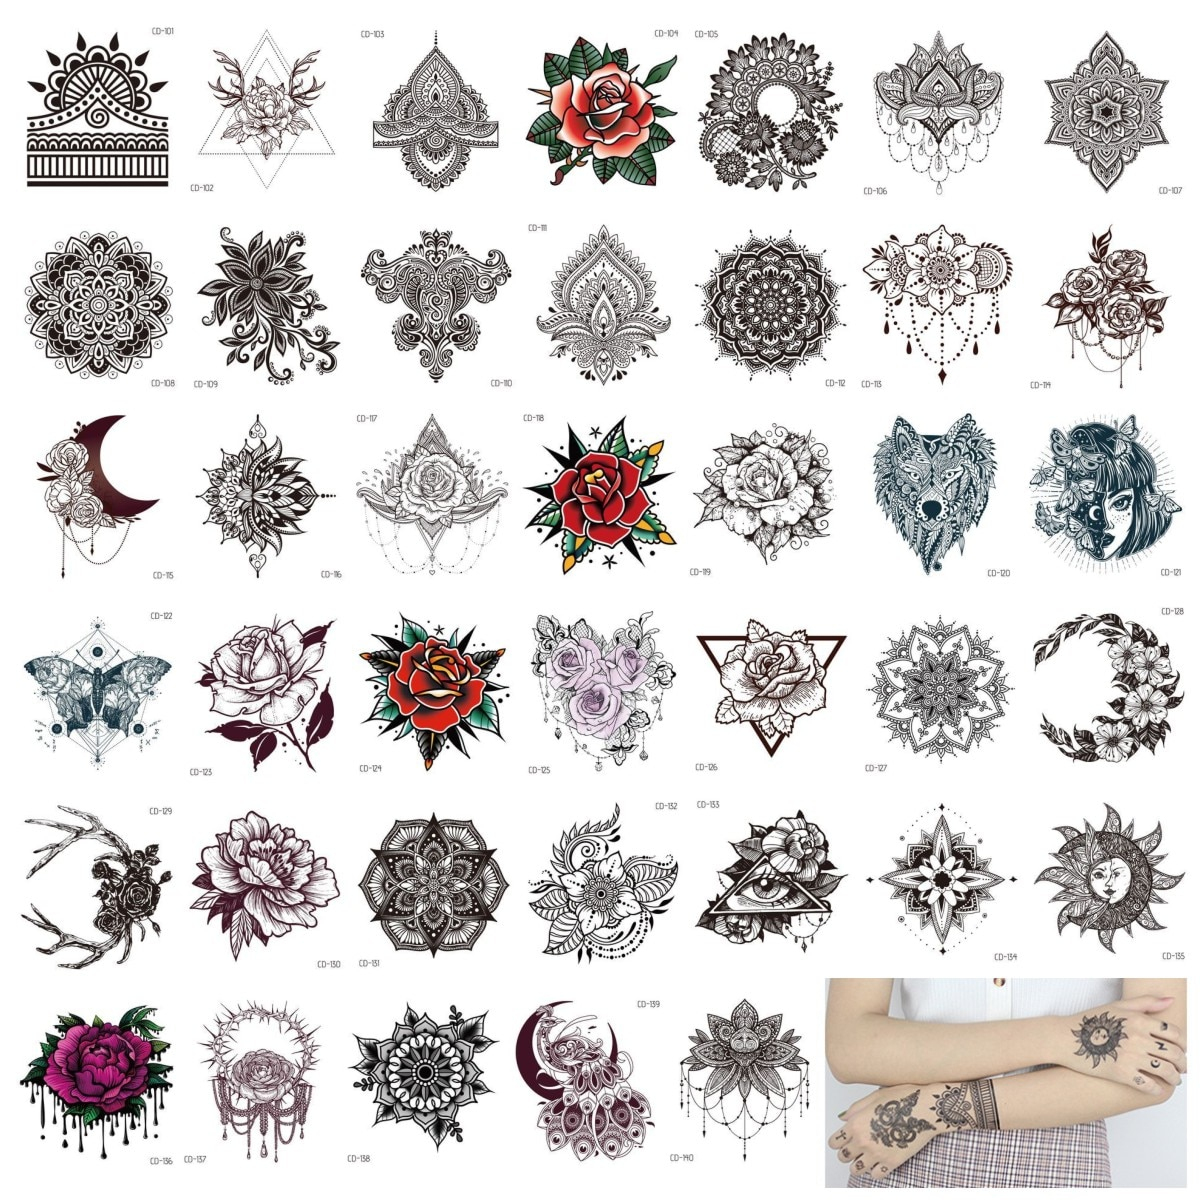 Us $7.79 22% Off|40Pcs Henna India Tattoos Sticker Black Temporary Tattoo  Paper Mandala Flower Rose Fake Tatto Stickers Hand Arm Foot Body encequiconcerne Mandala Fée